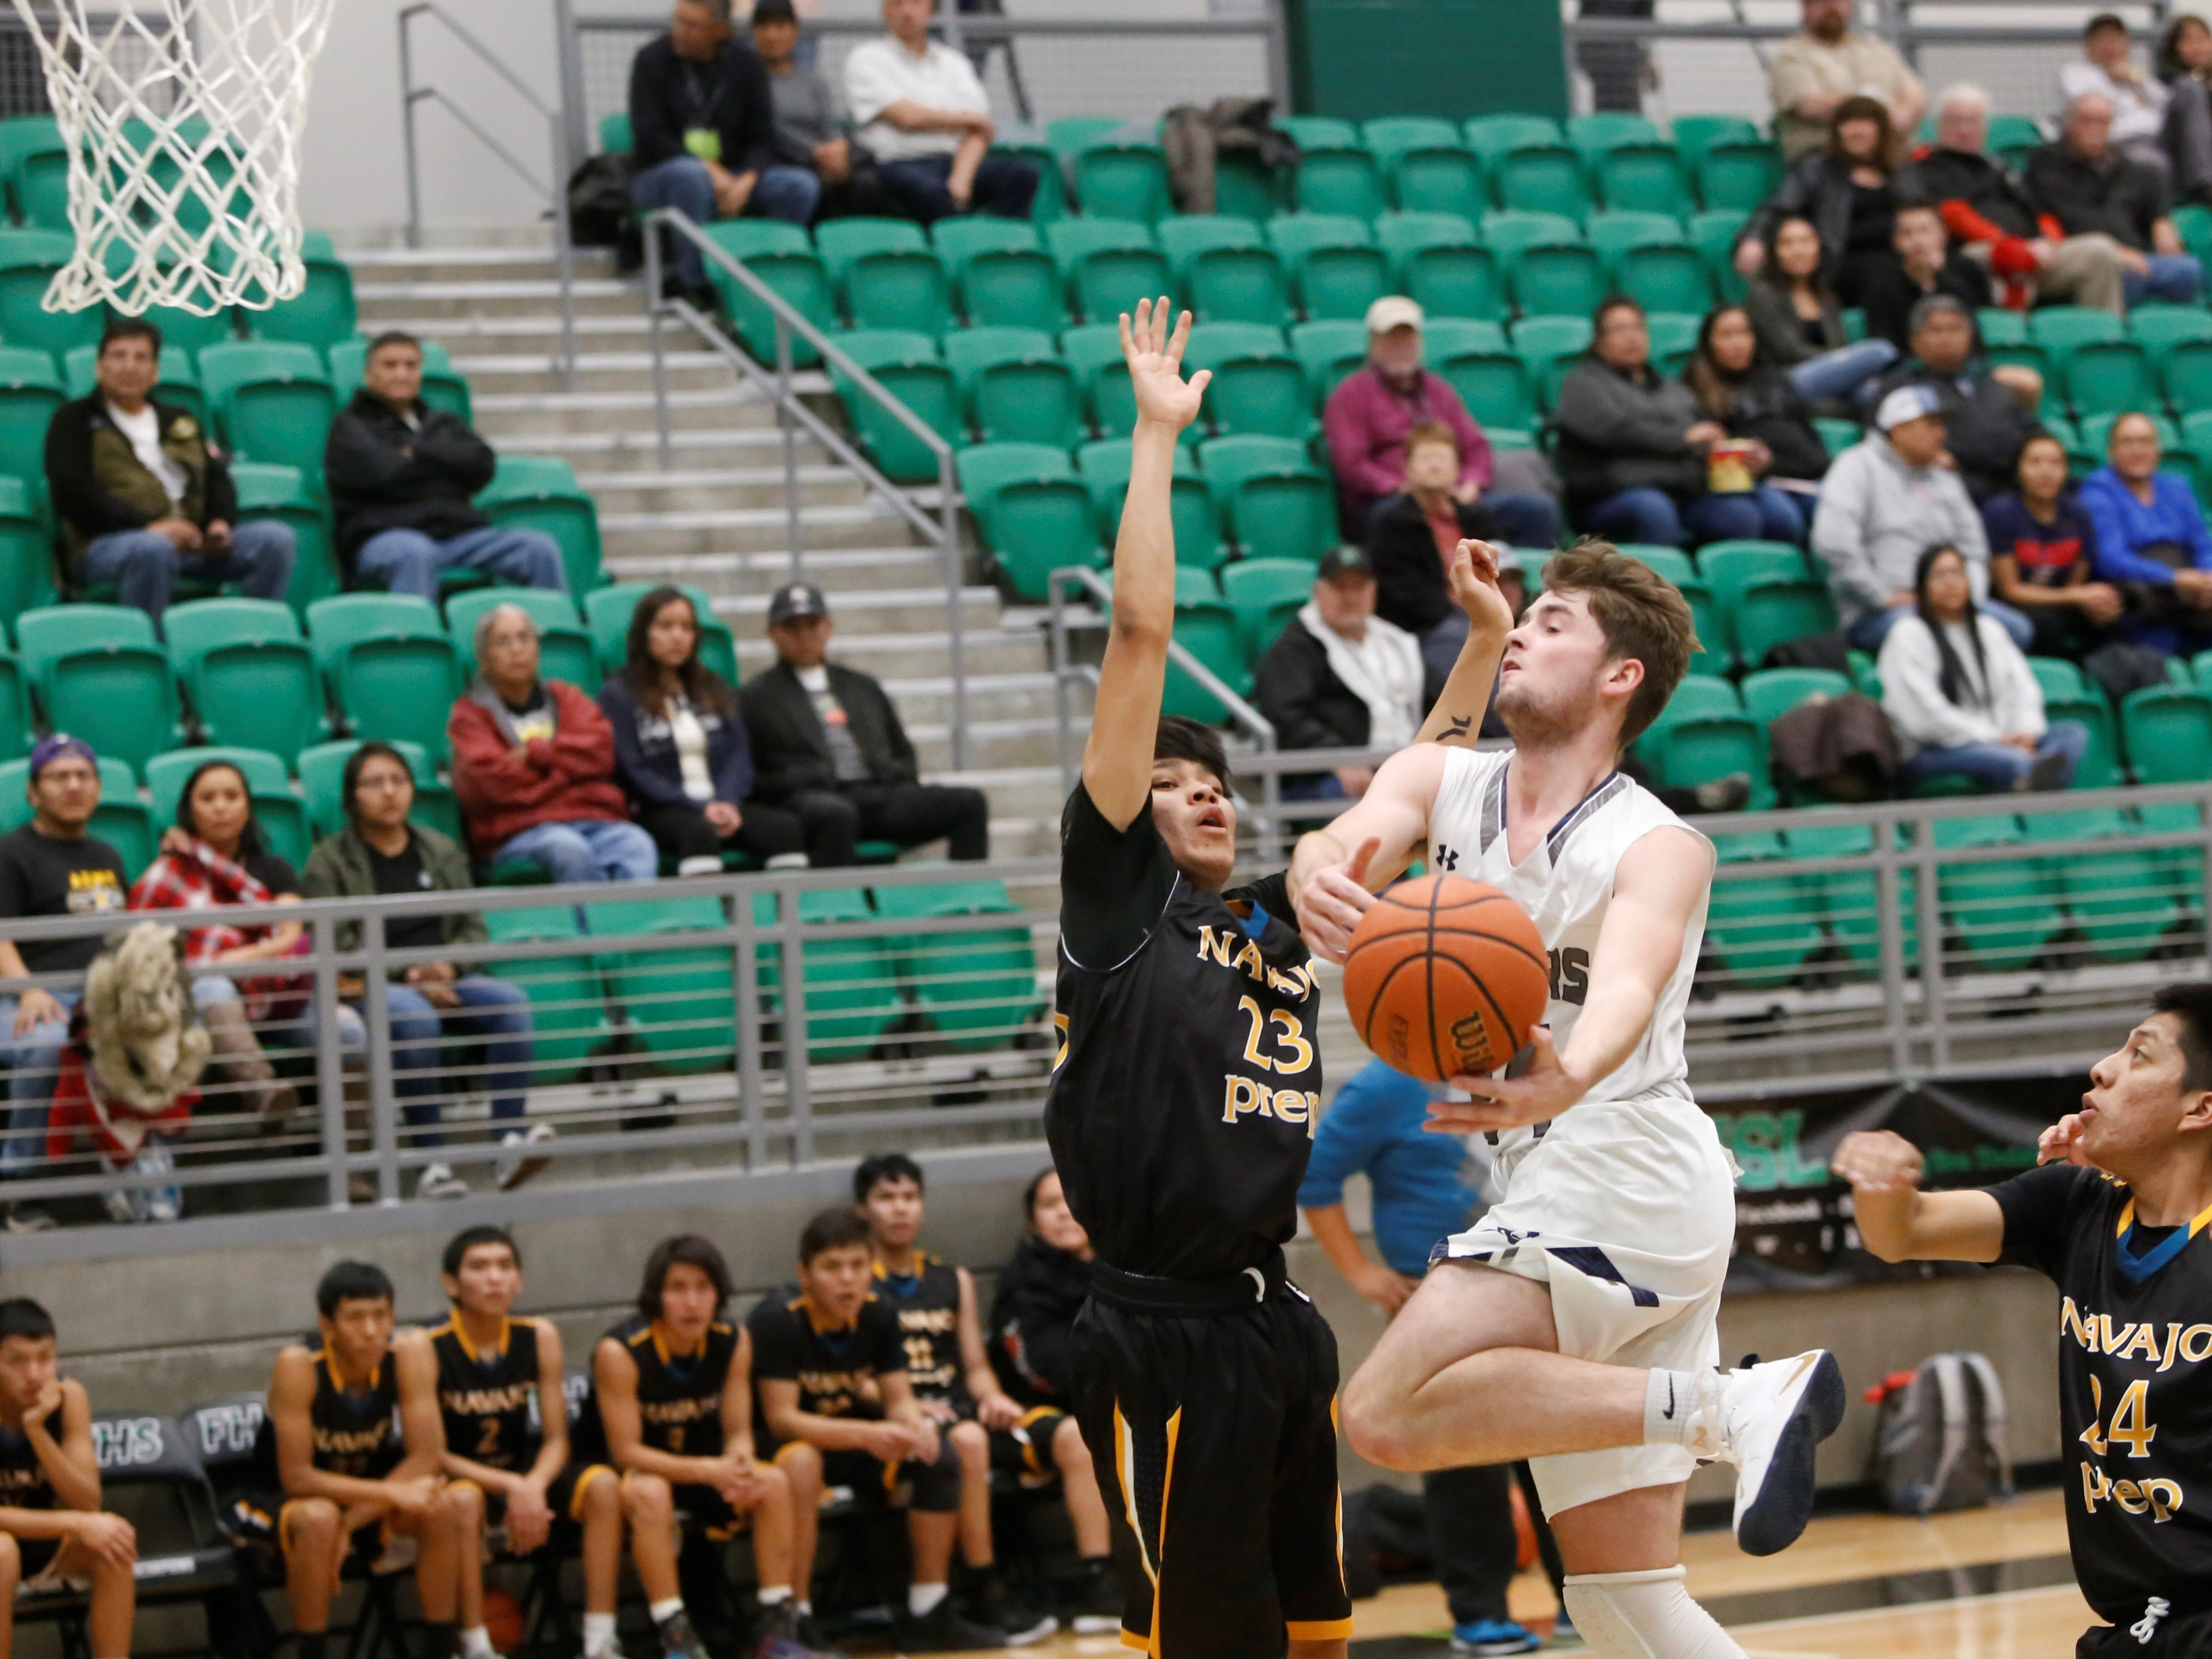 Piedra Vista's Lake Houston attacks the basket against Navajo Prep's Trejan Clichee during the Marv Sanders Invitational quarterfinals Thursday at Scorpion Arena in Farmington.